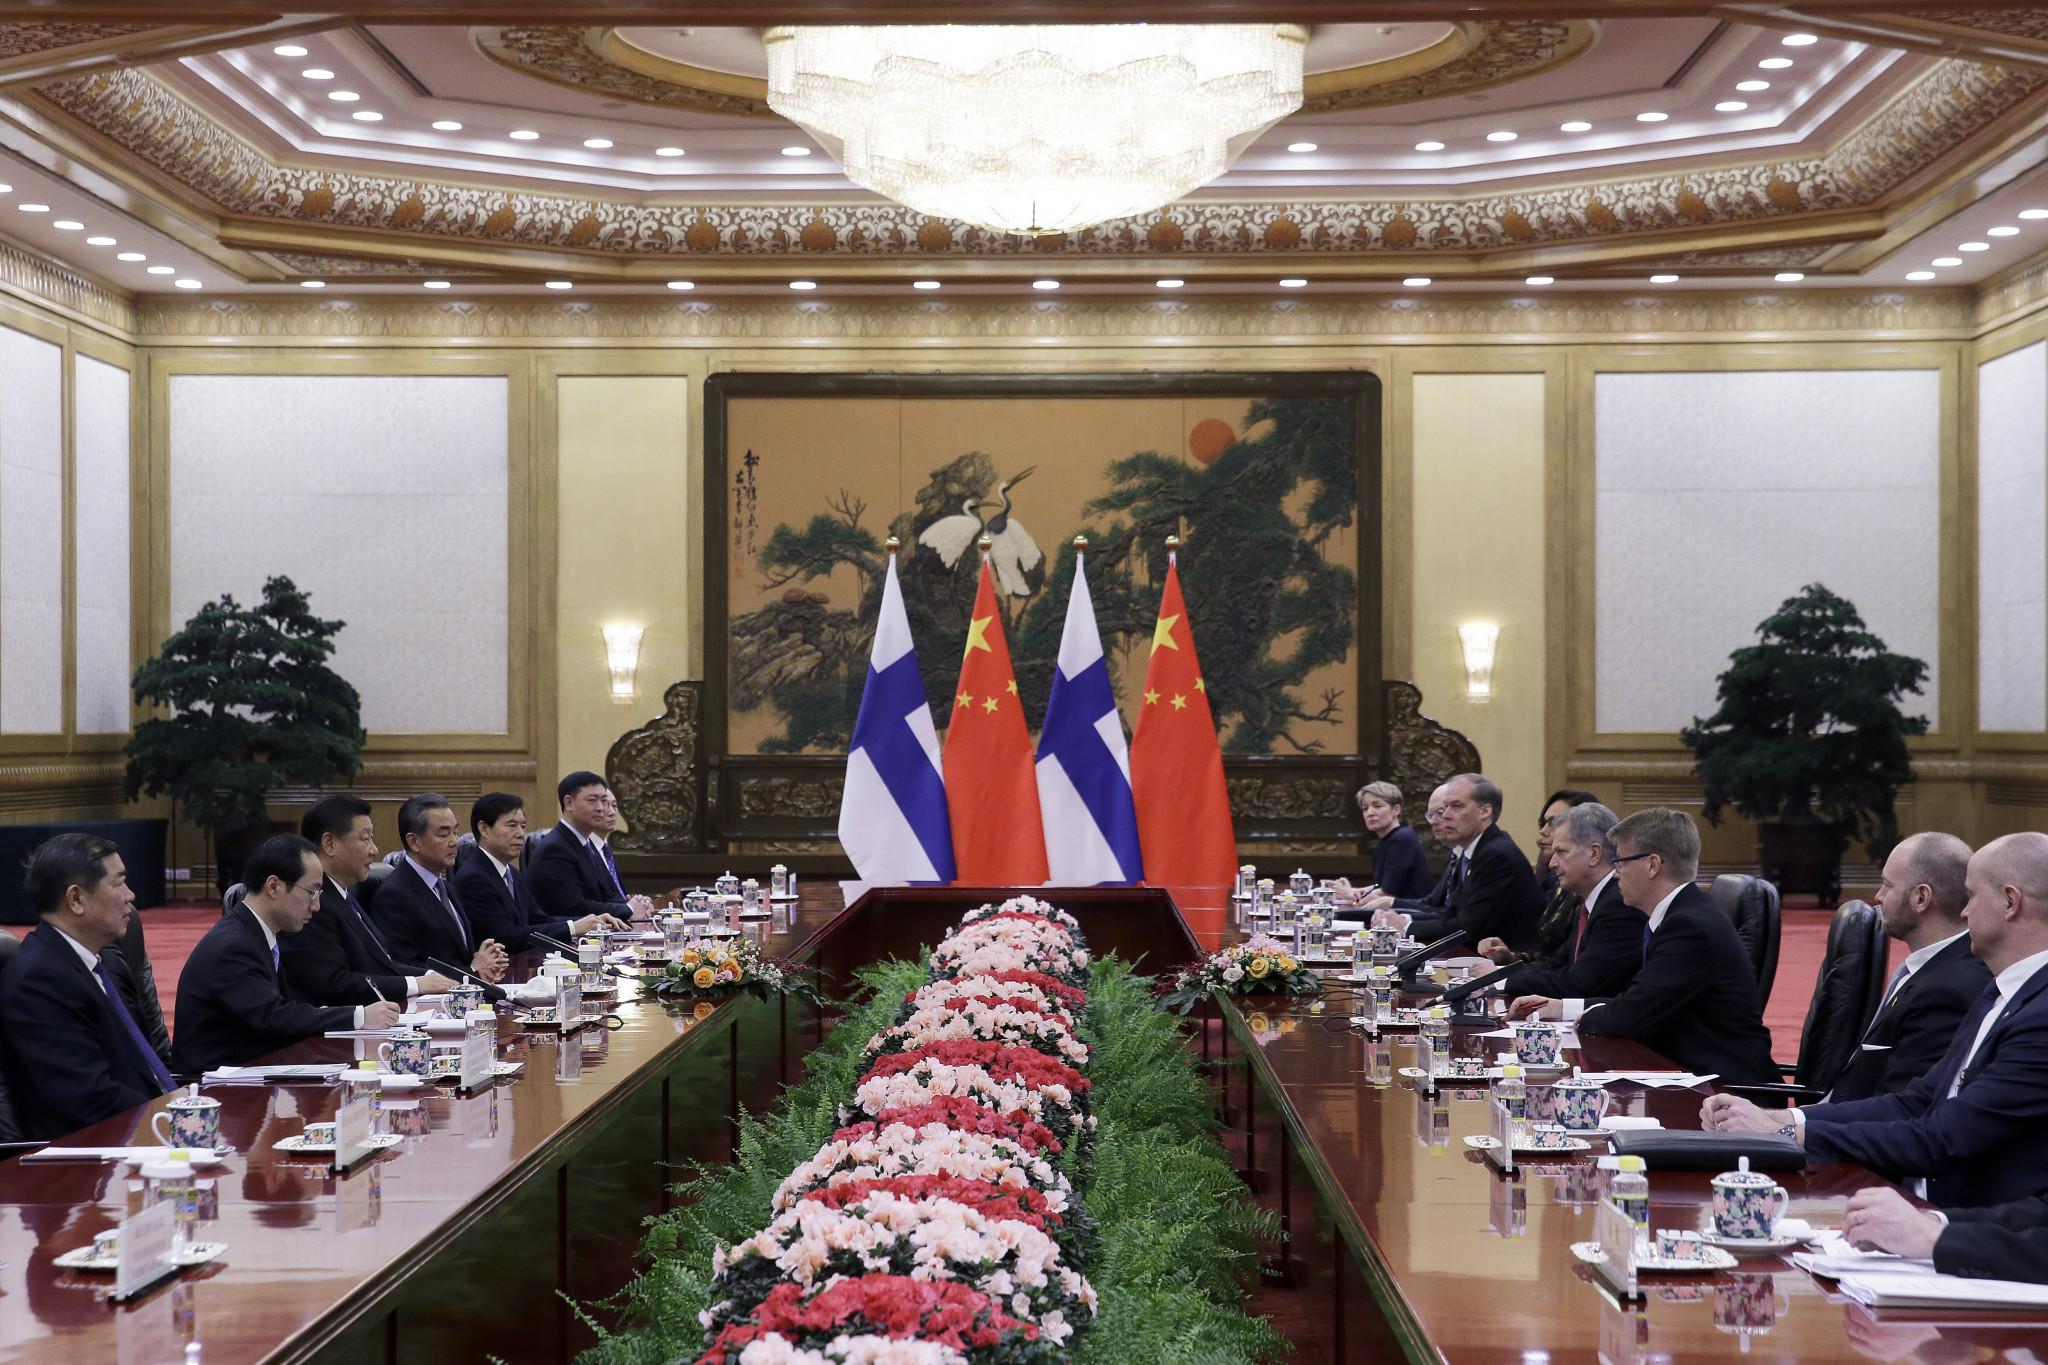 Finnish President Sauli Niinistö visited Beijing this week ©Getty Images